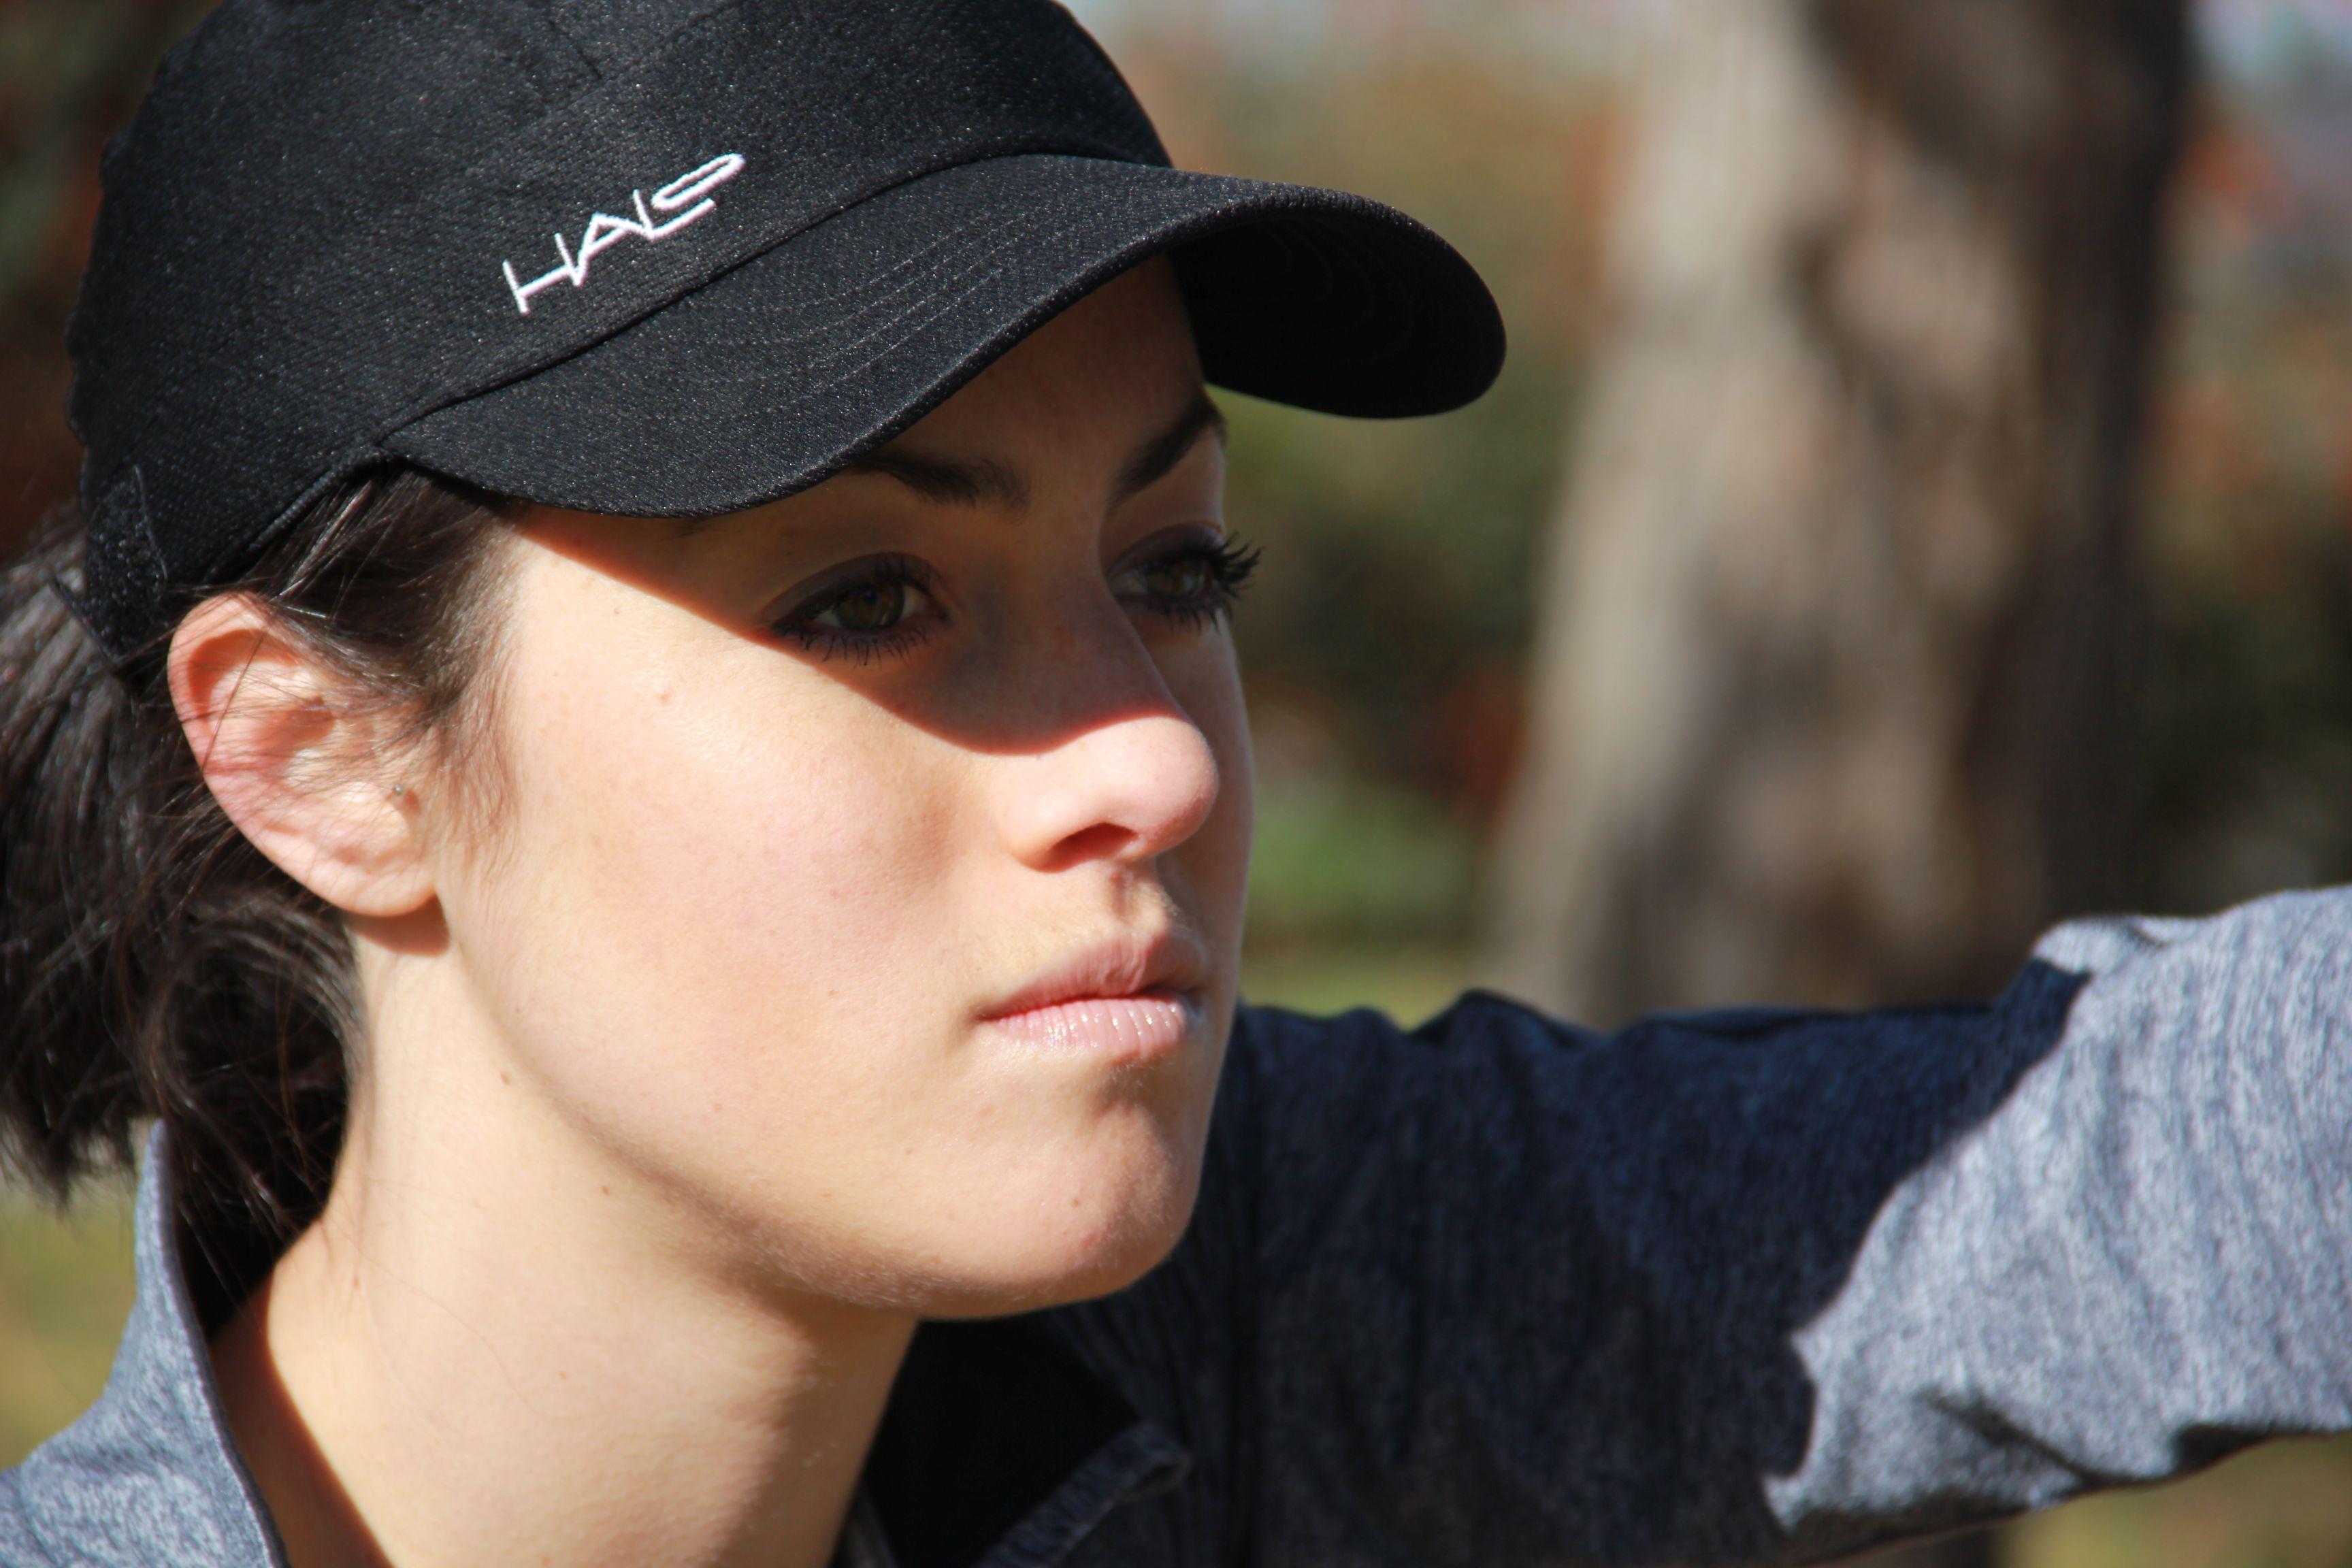 Halo Sport Cap (With images) Halo headband, Sports caps